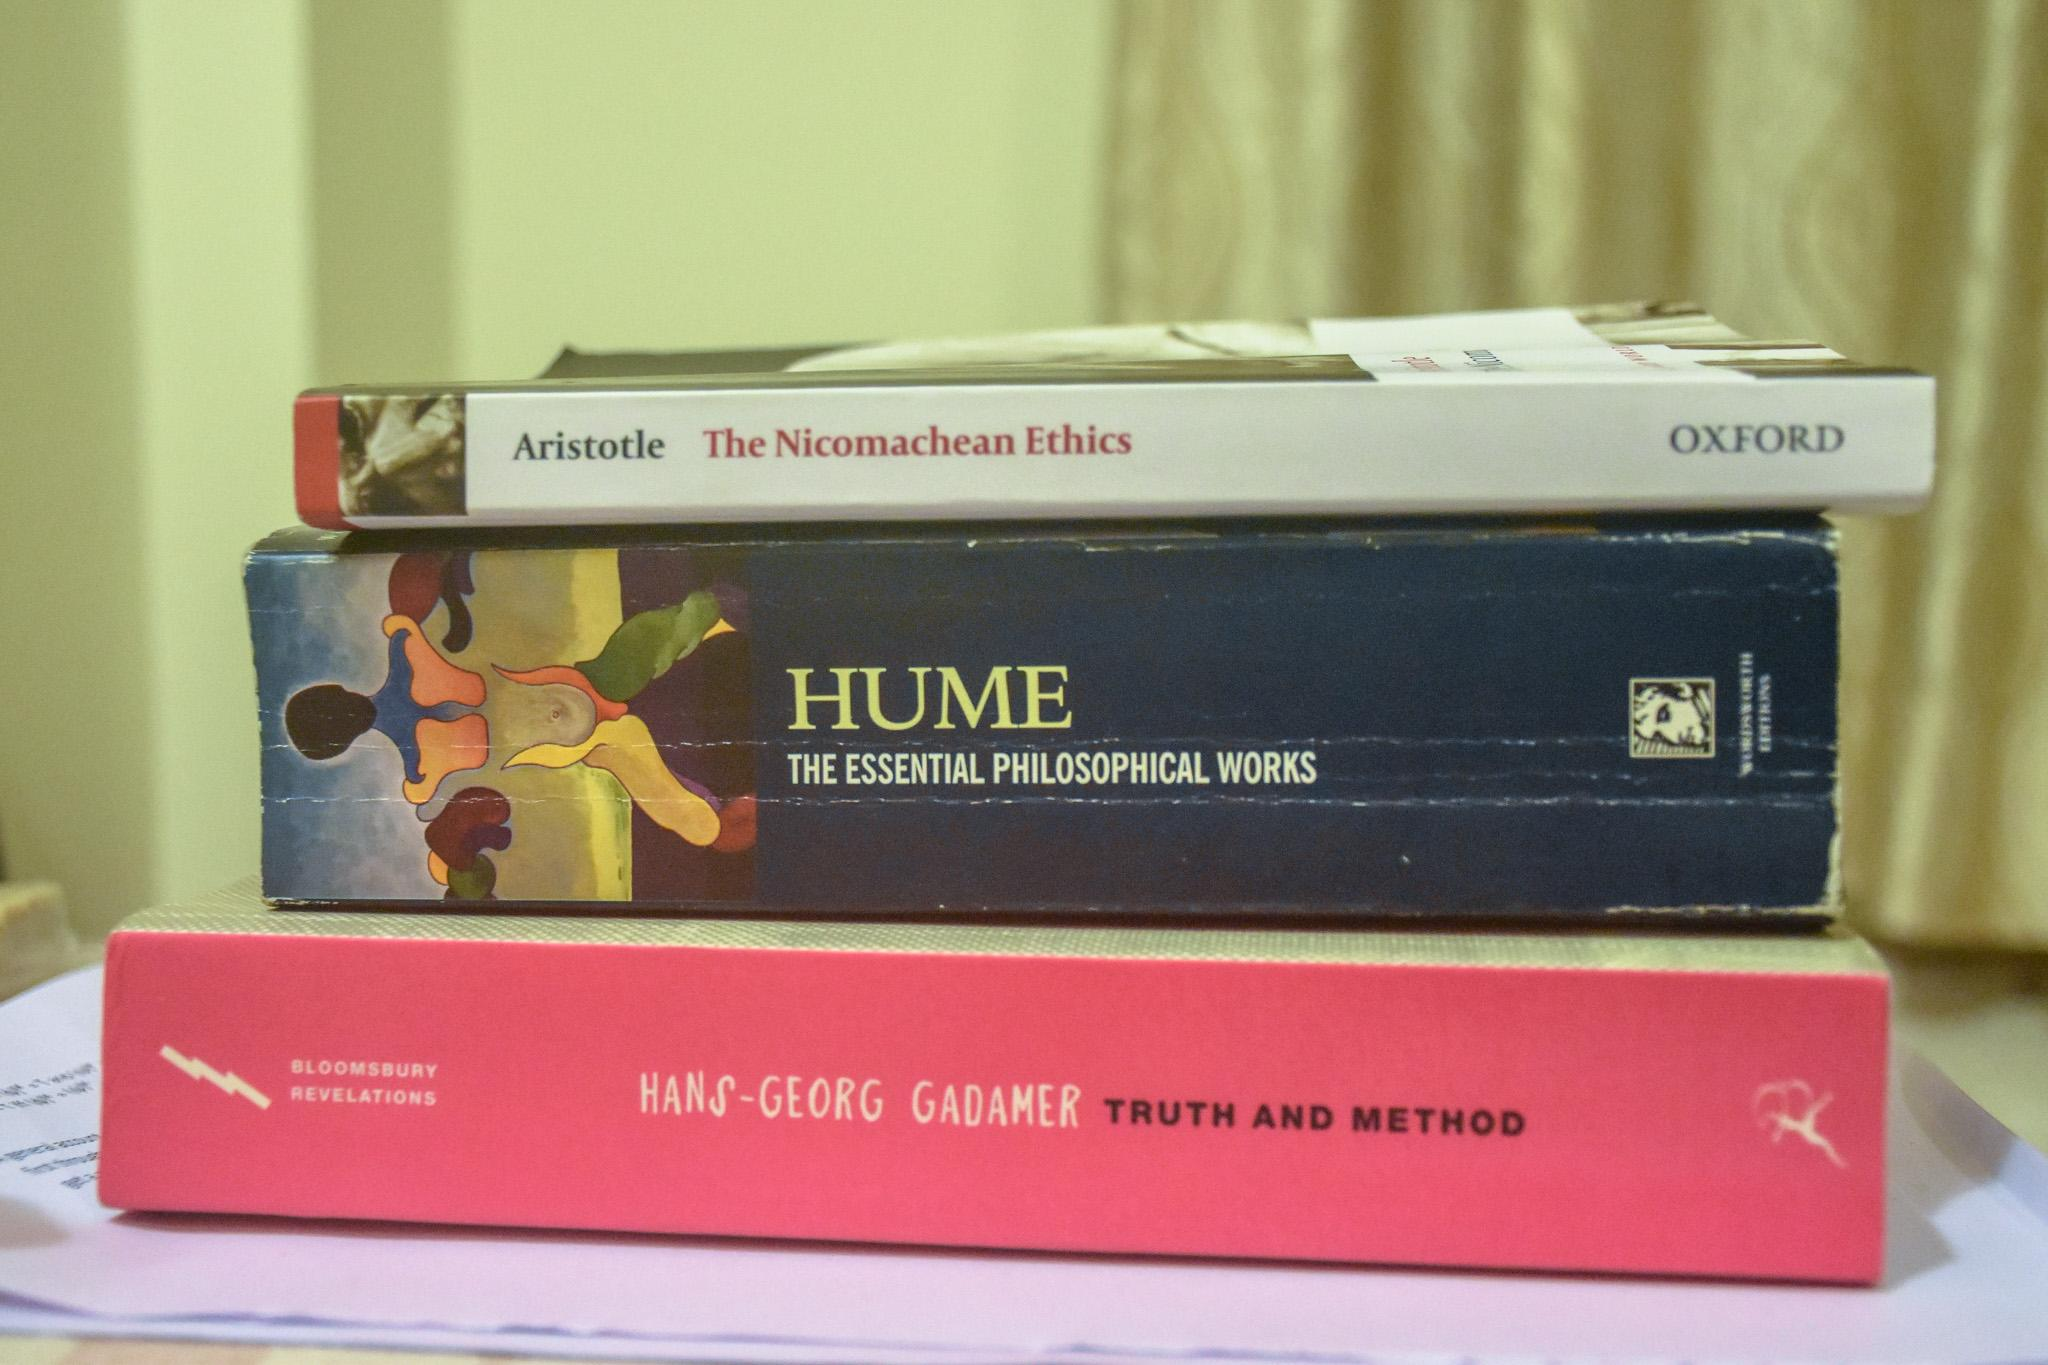 Books on philosophy